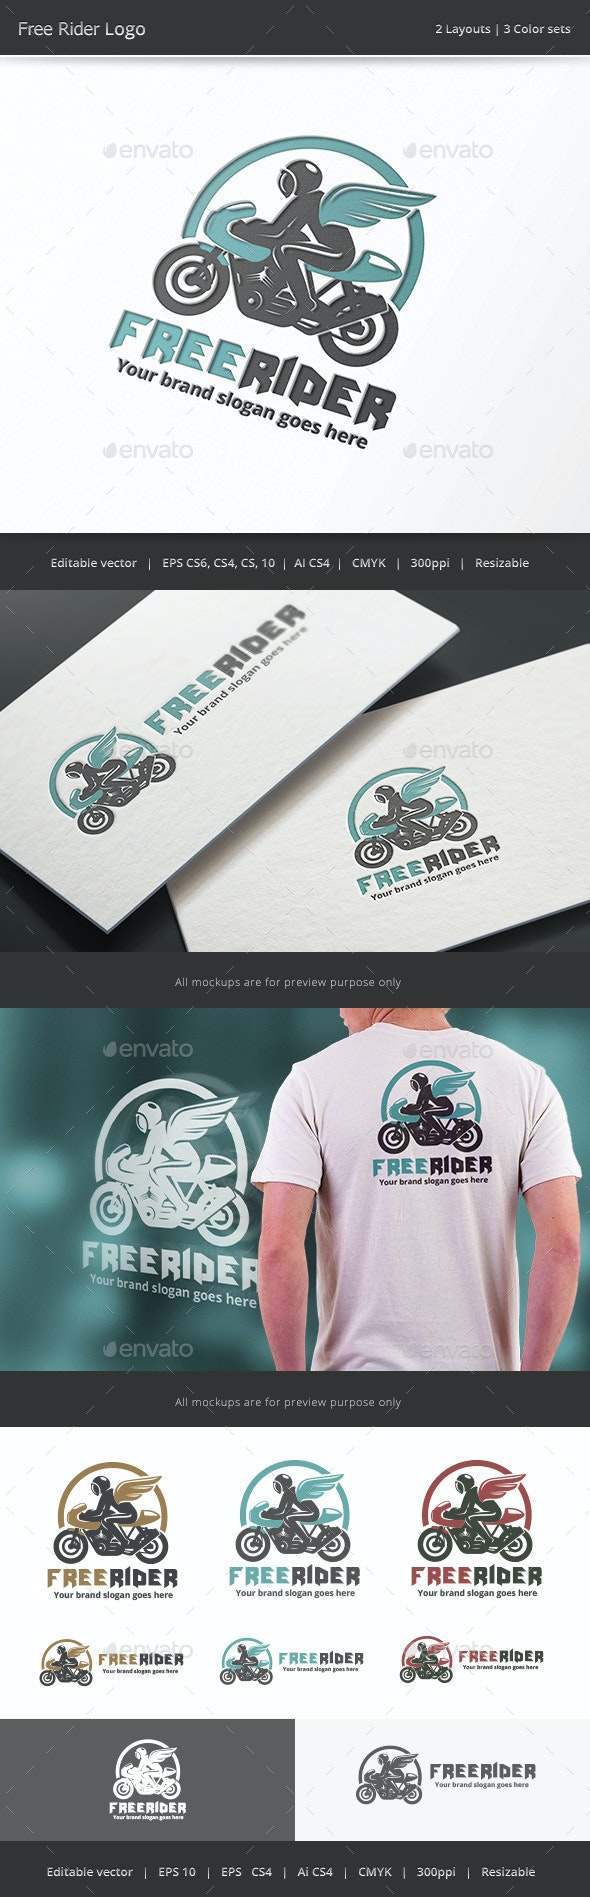 Freedom Rider Logo - Vector Abstract